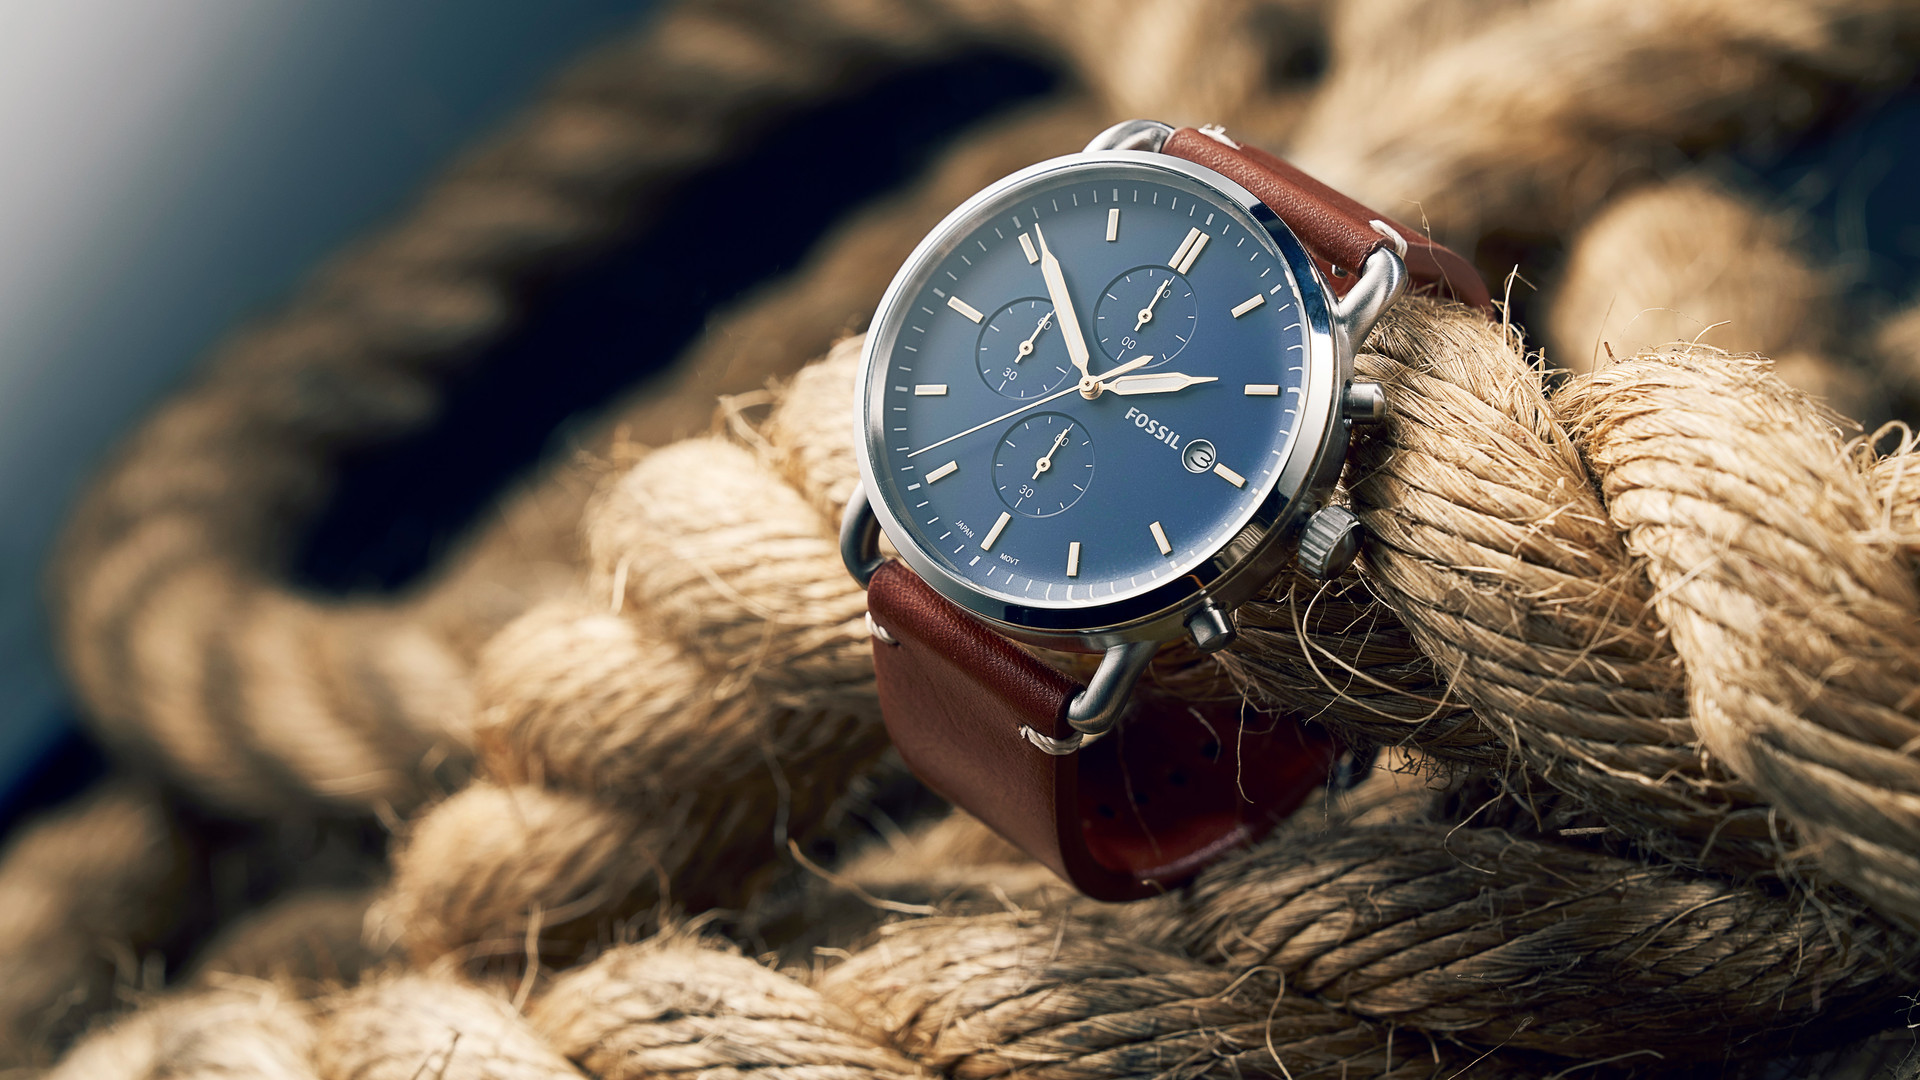 Fossil_watch (1).jpg